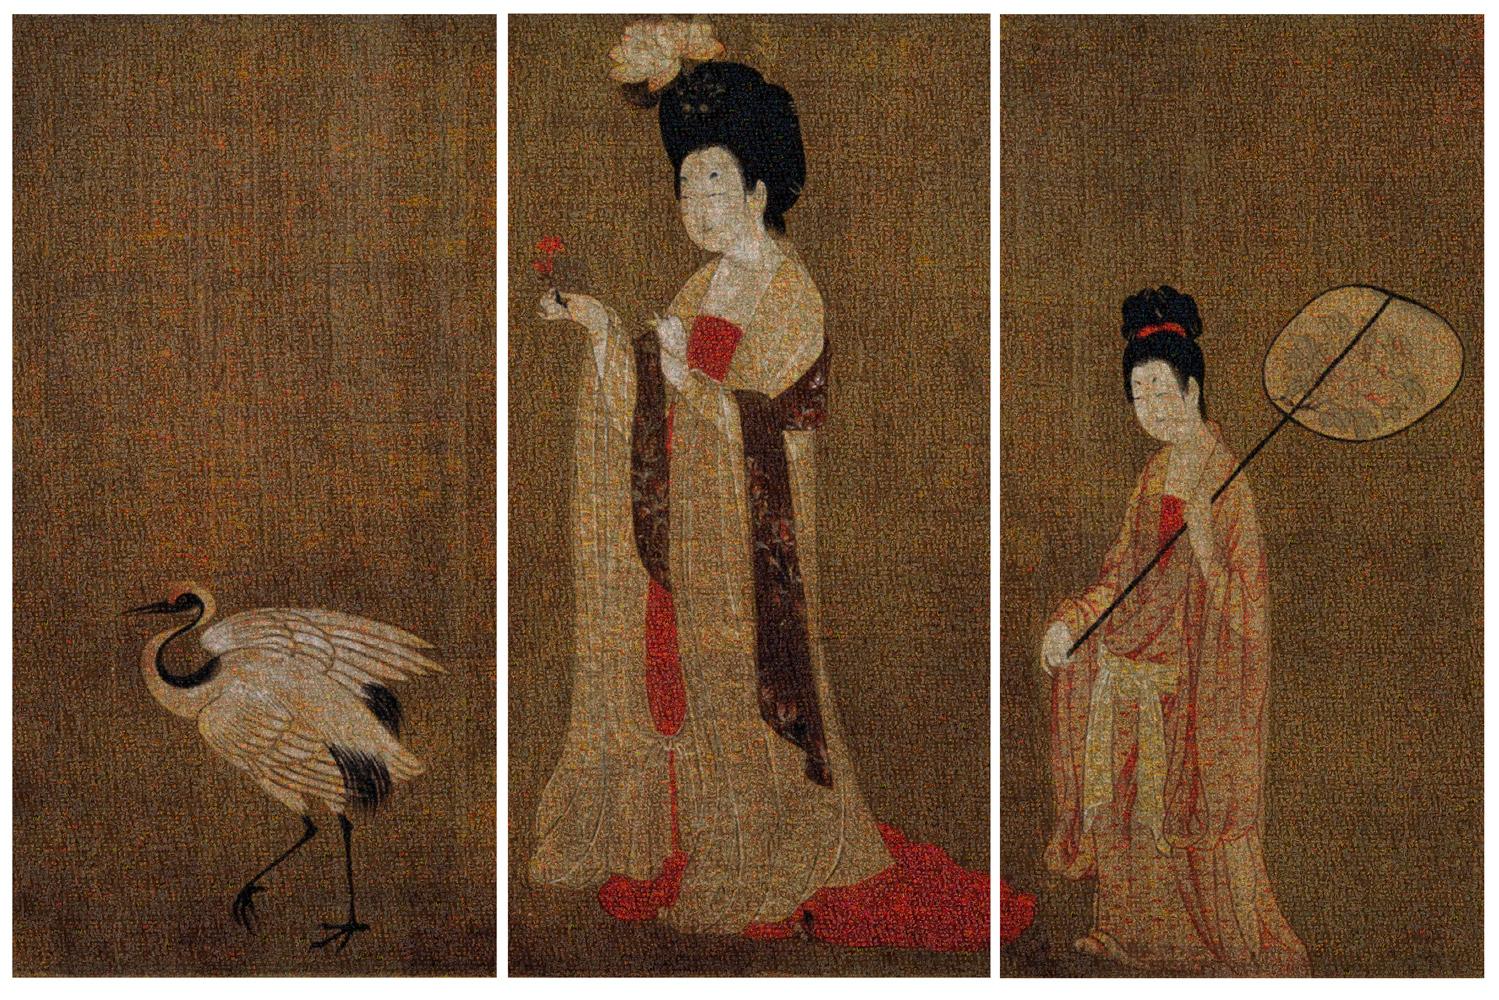 GUO JIAN   The Beauty No.1  2016 Inkjet pigment print (3 panels) 200 cm x 300 cm